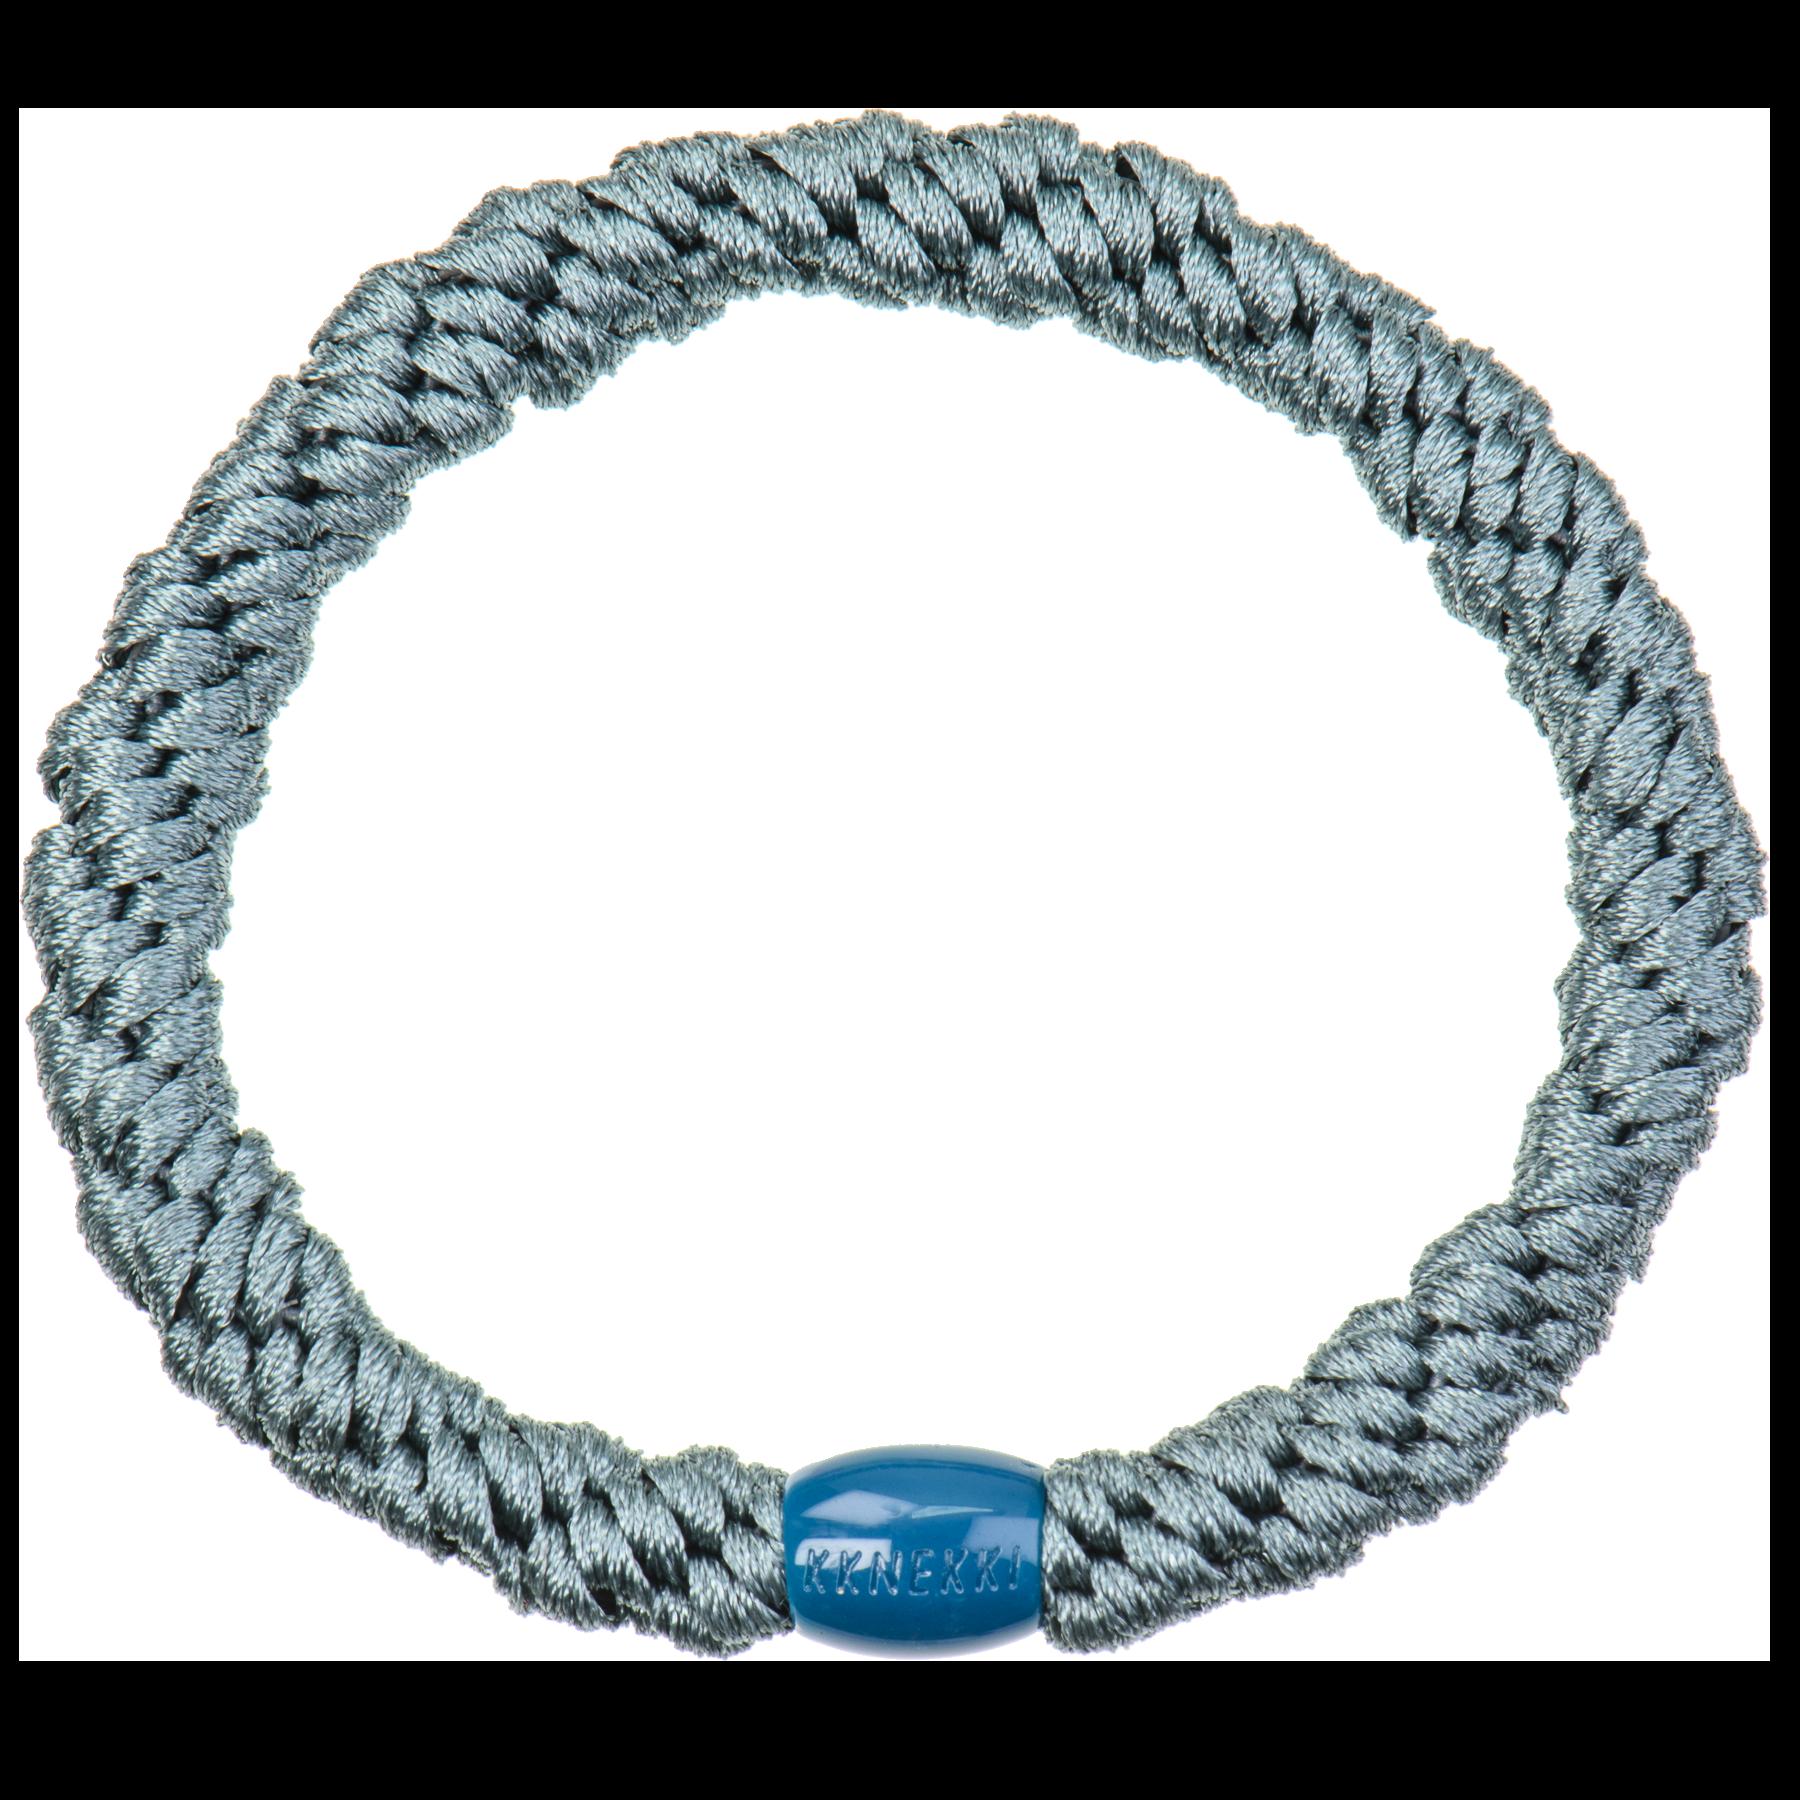 Haargummi / Armband - Dark teal 5159 - KKNEKKI